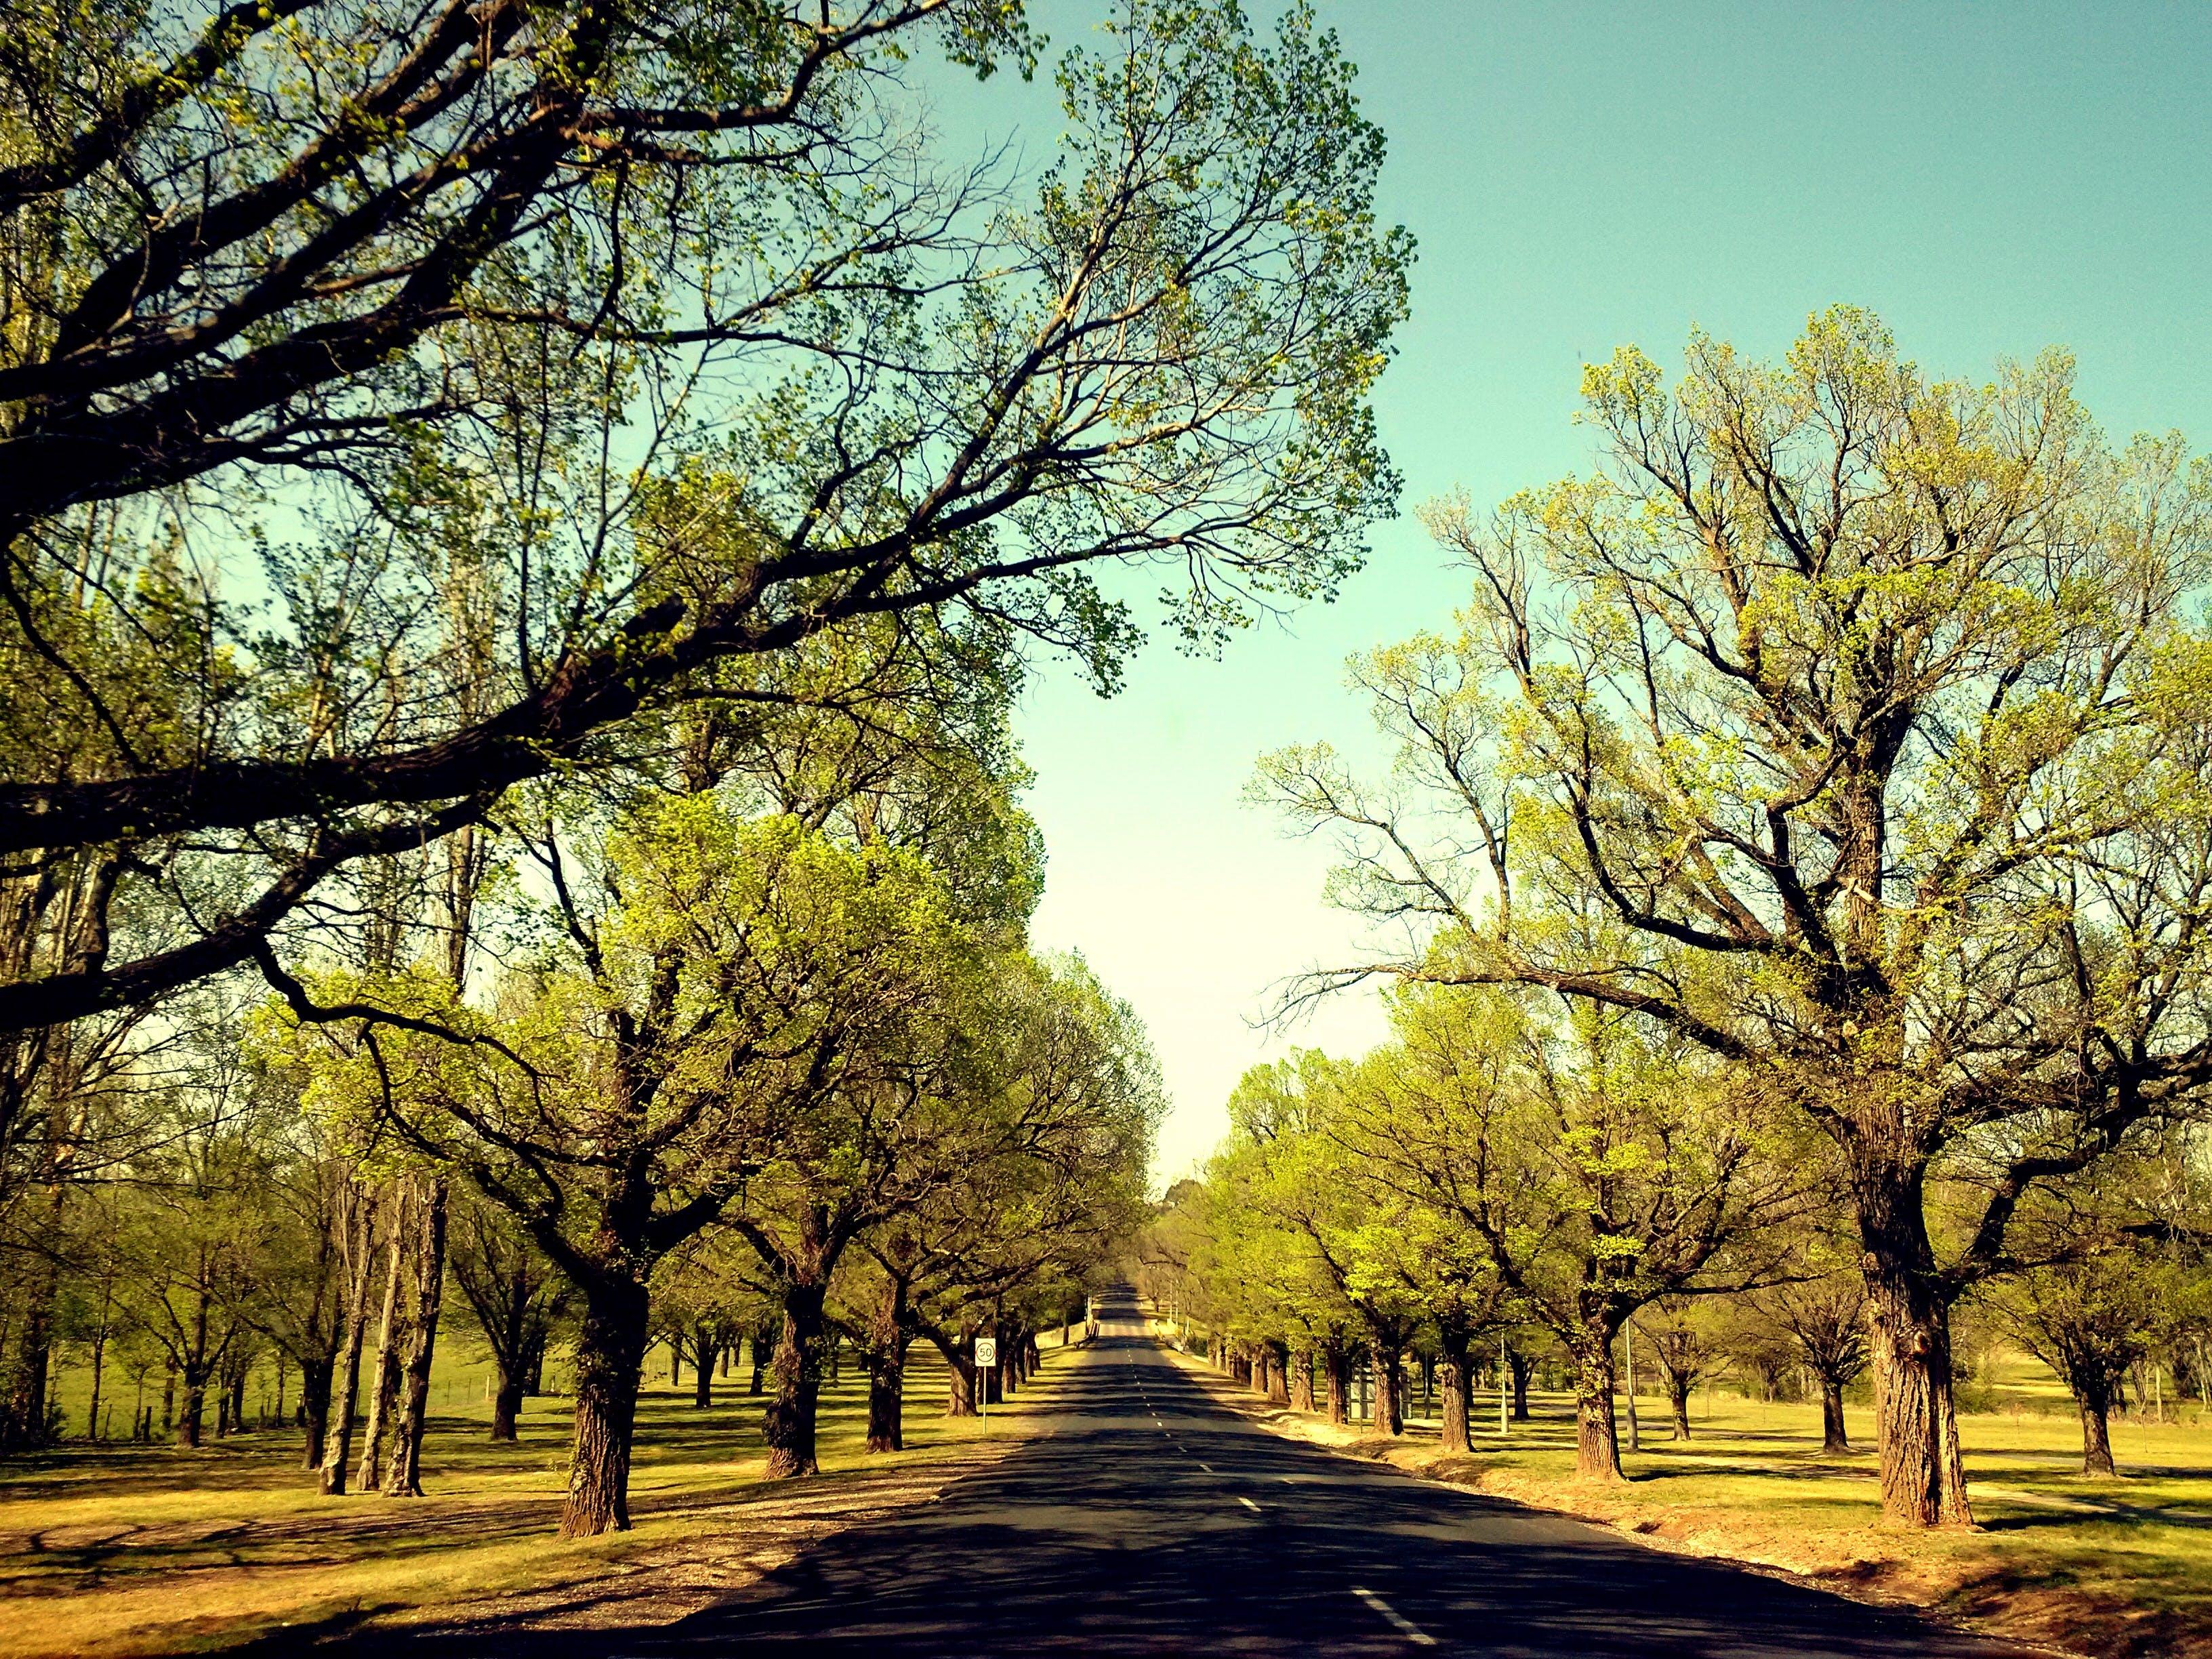 Free stock photo of elm trees, road, spring, trees